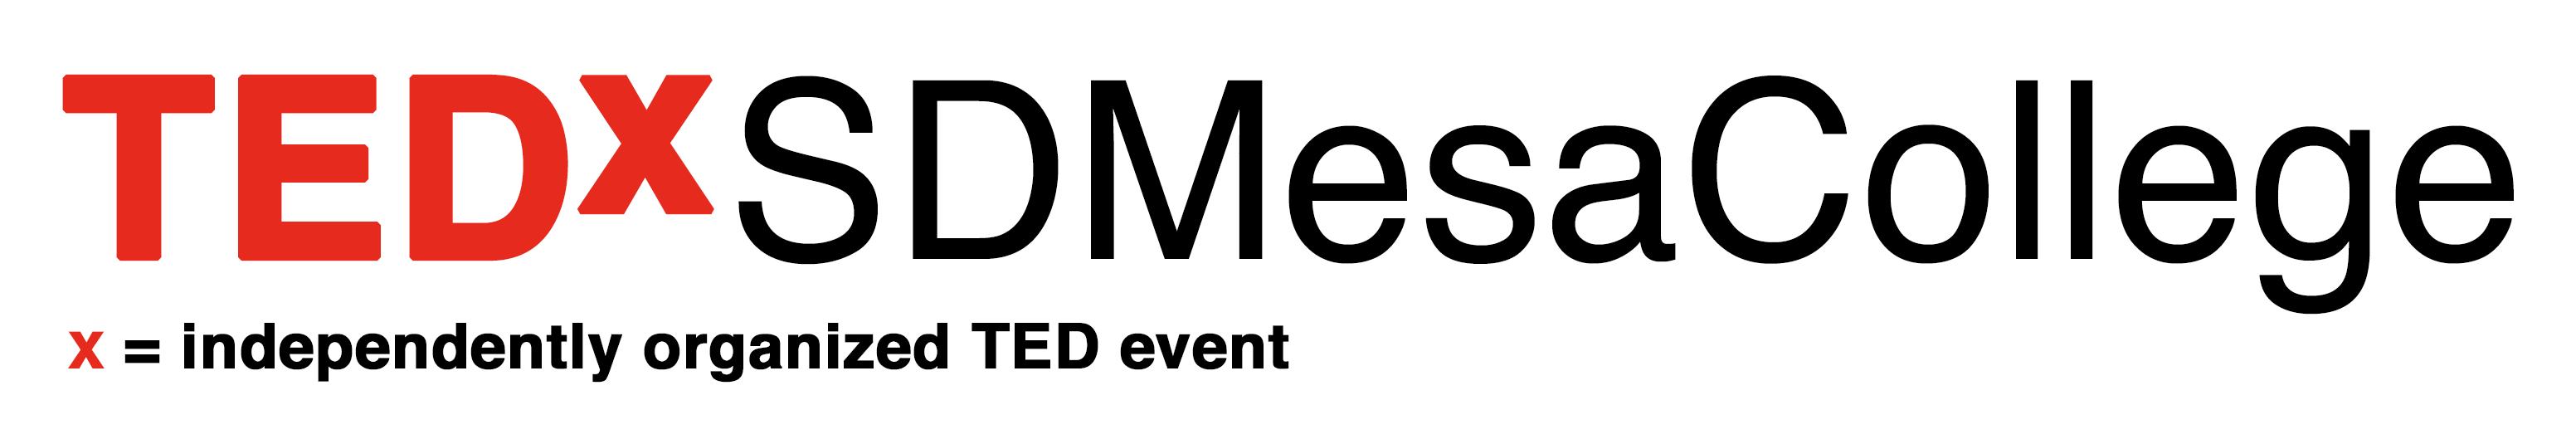 TEDxSDMesaCollege in San Diego California